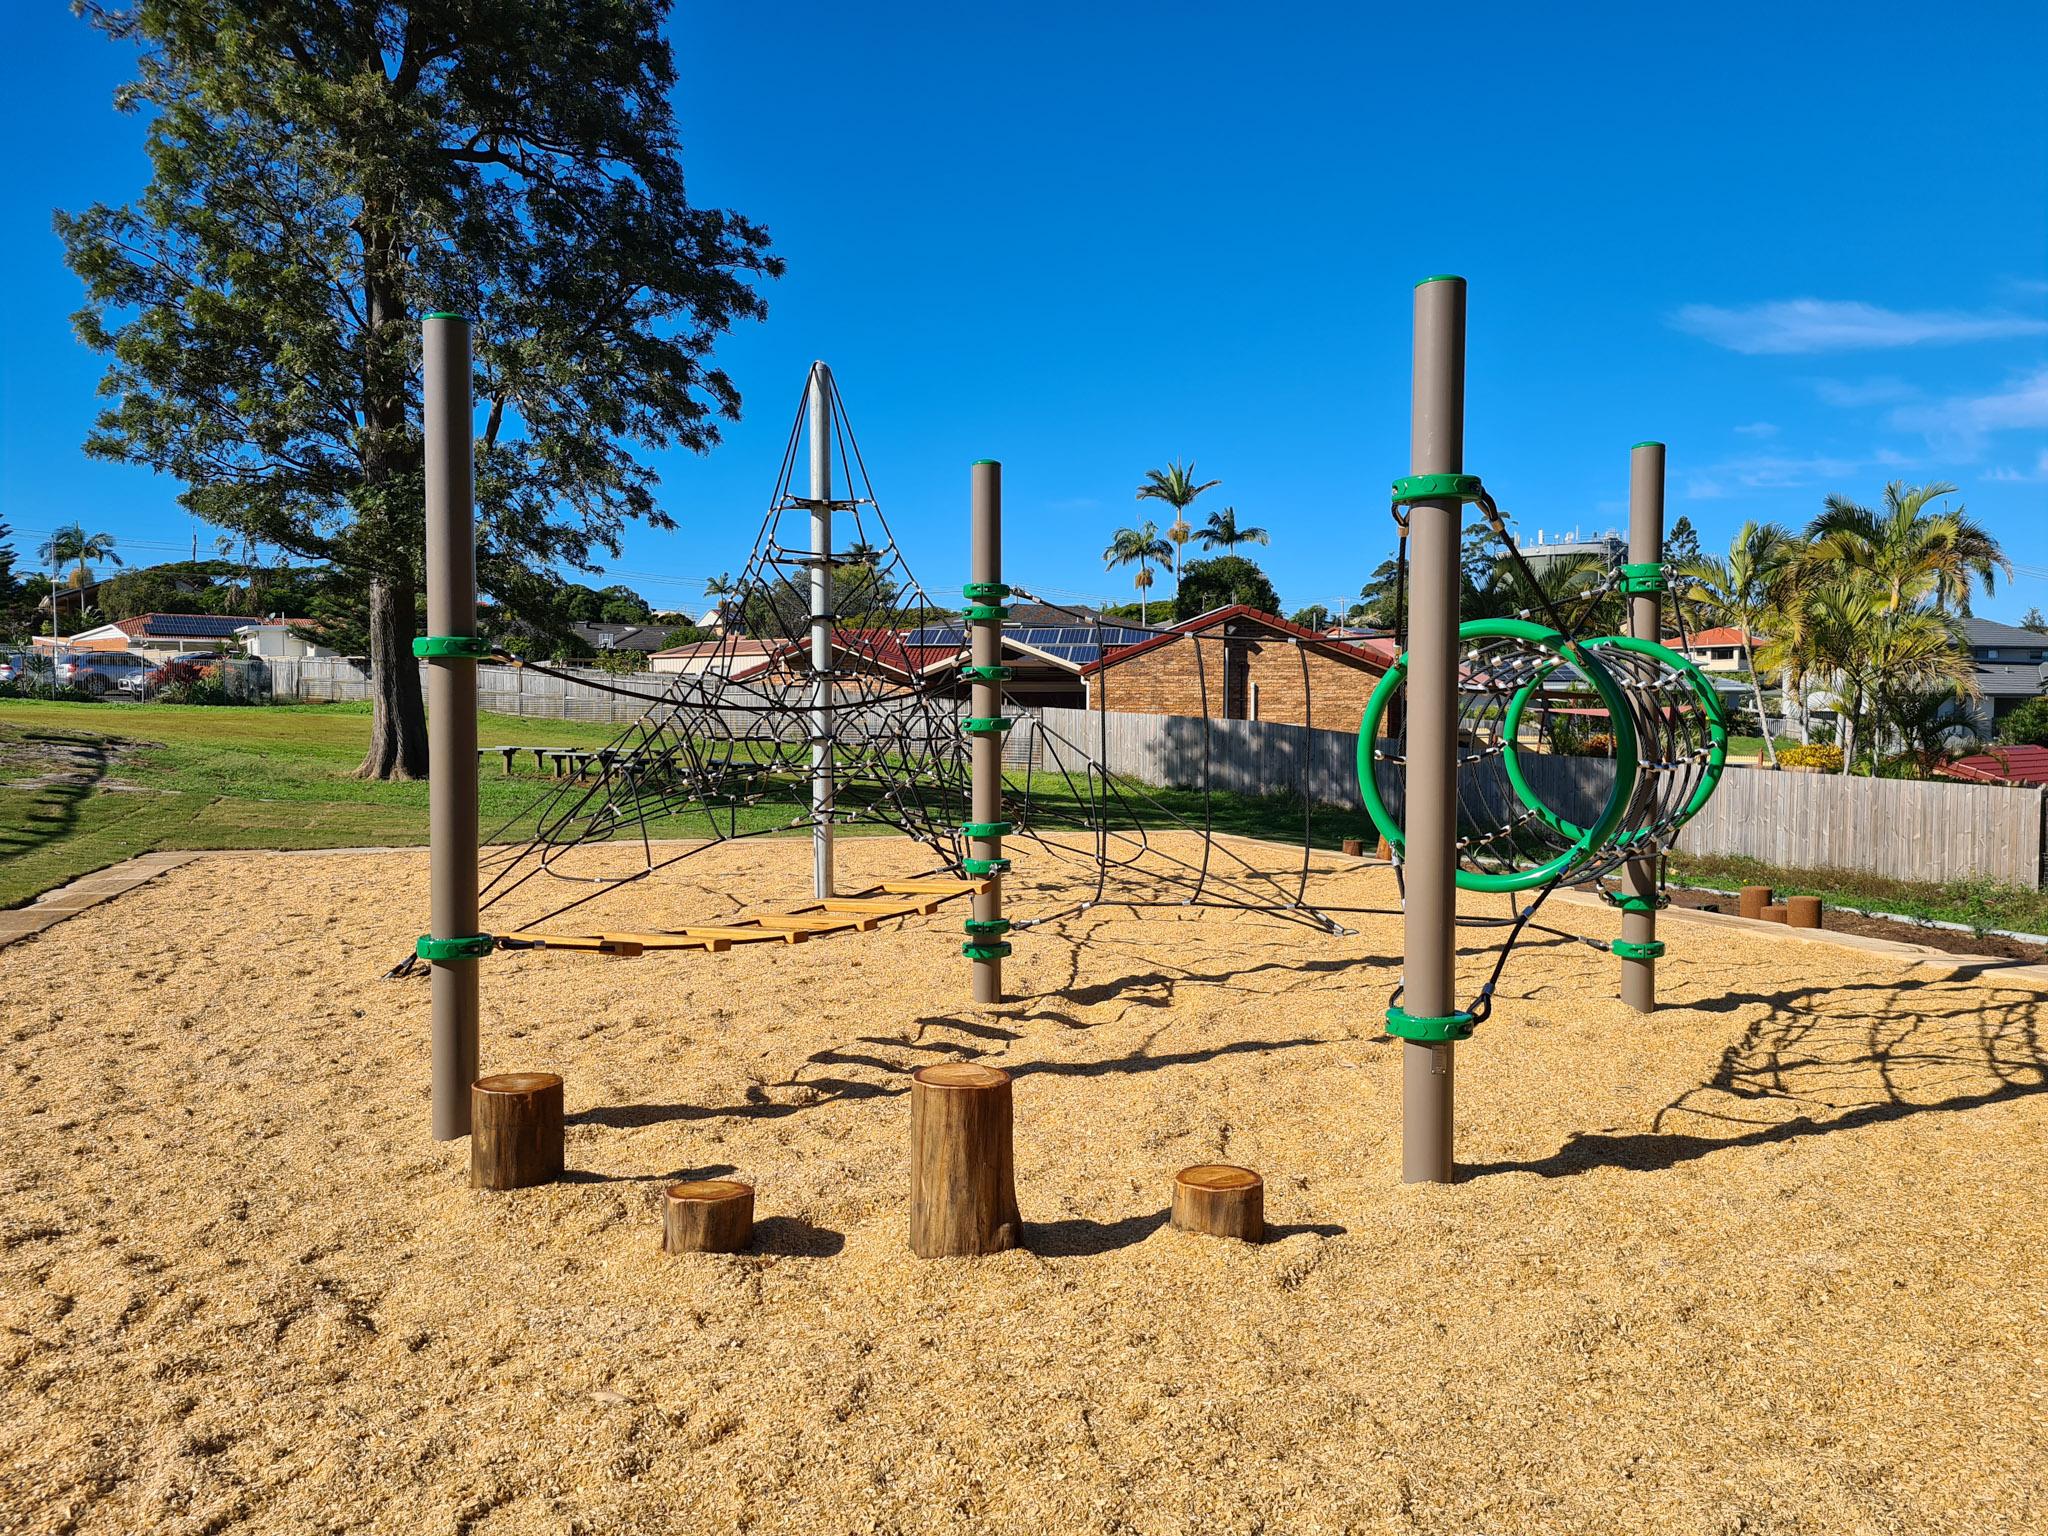 palm-beach-state-school-playrground-austek-play-23